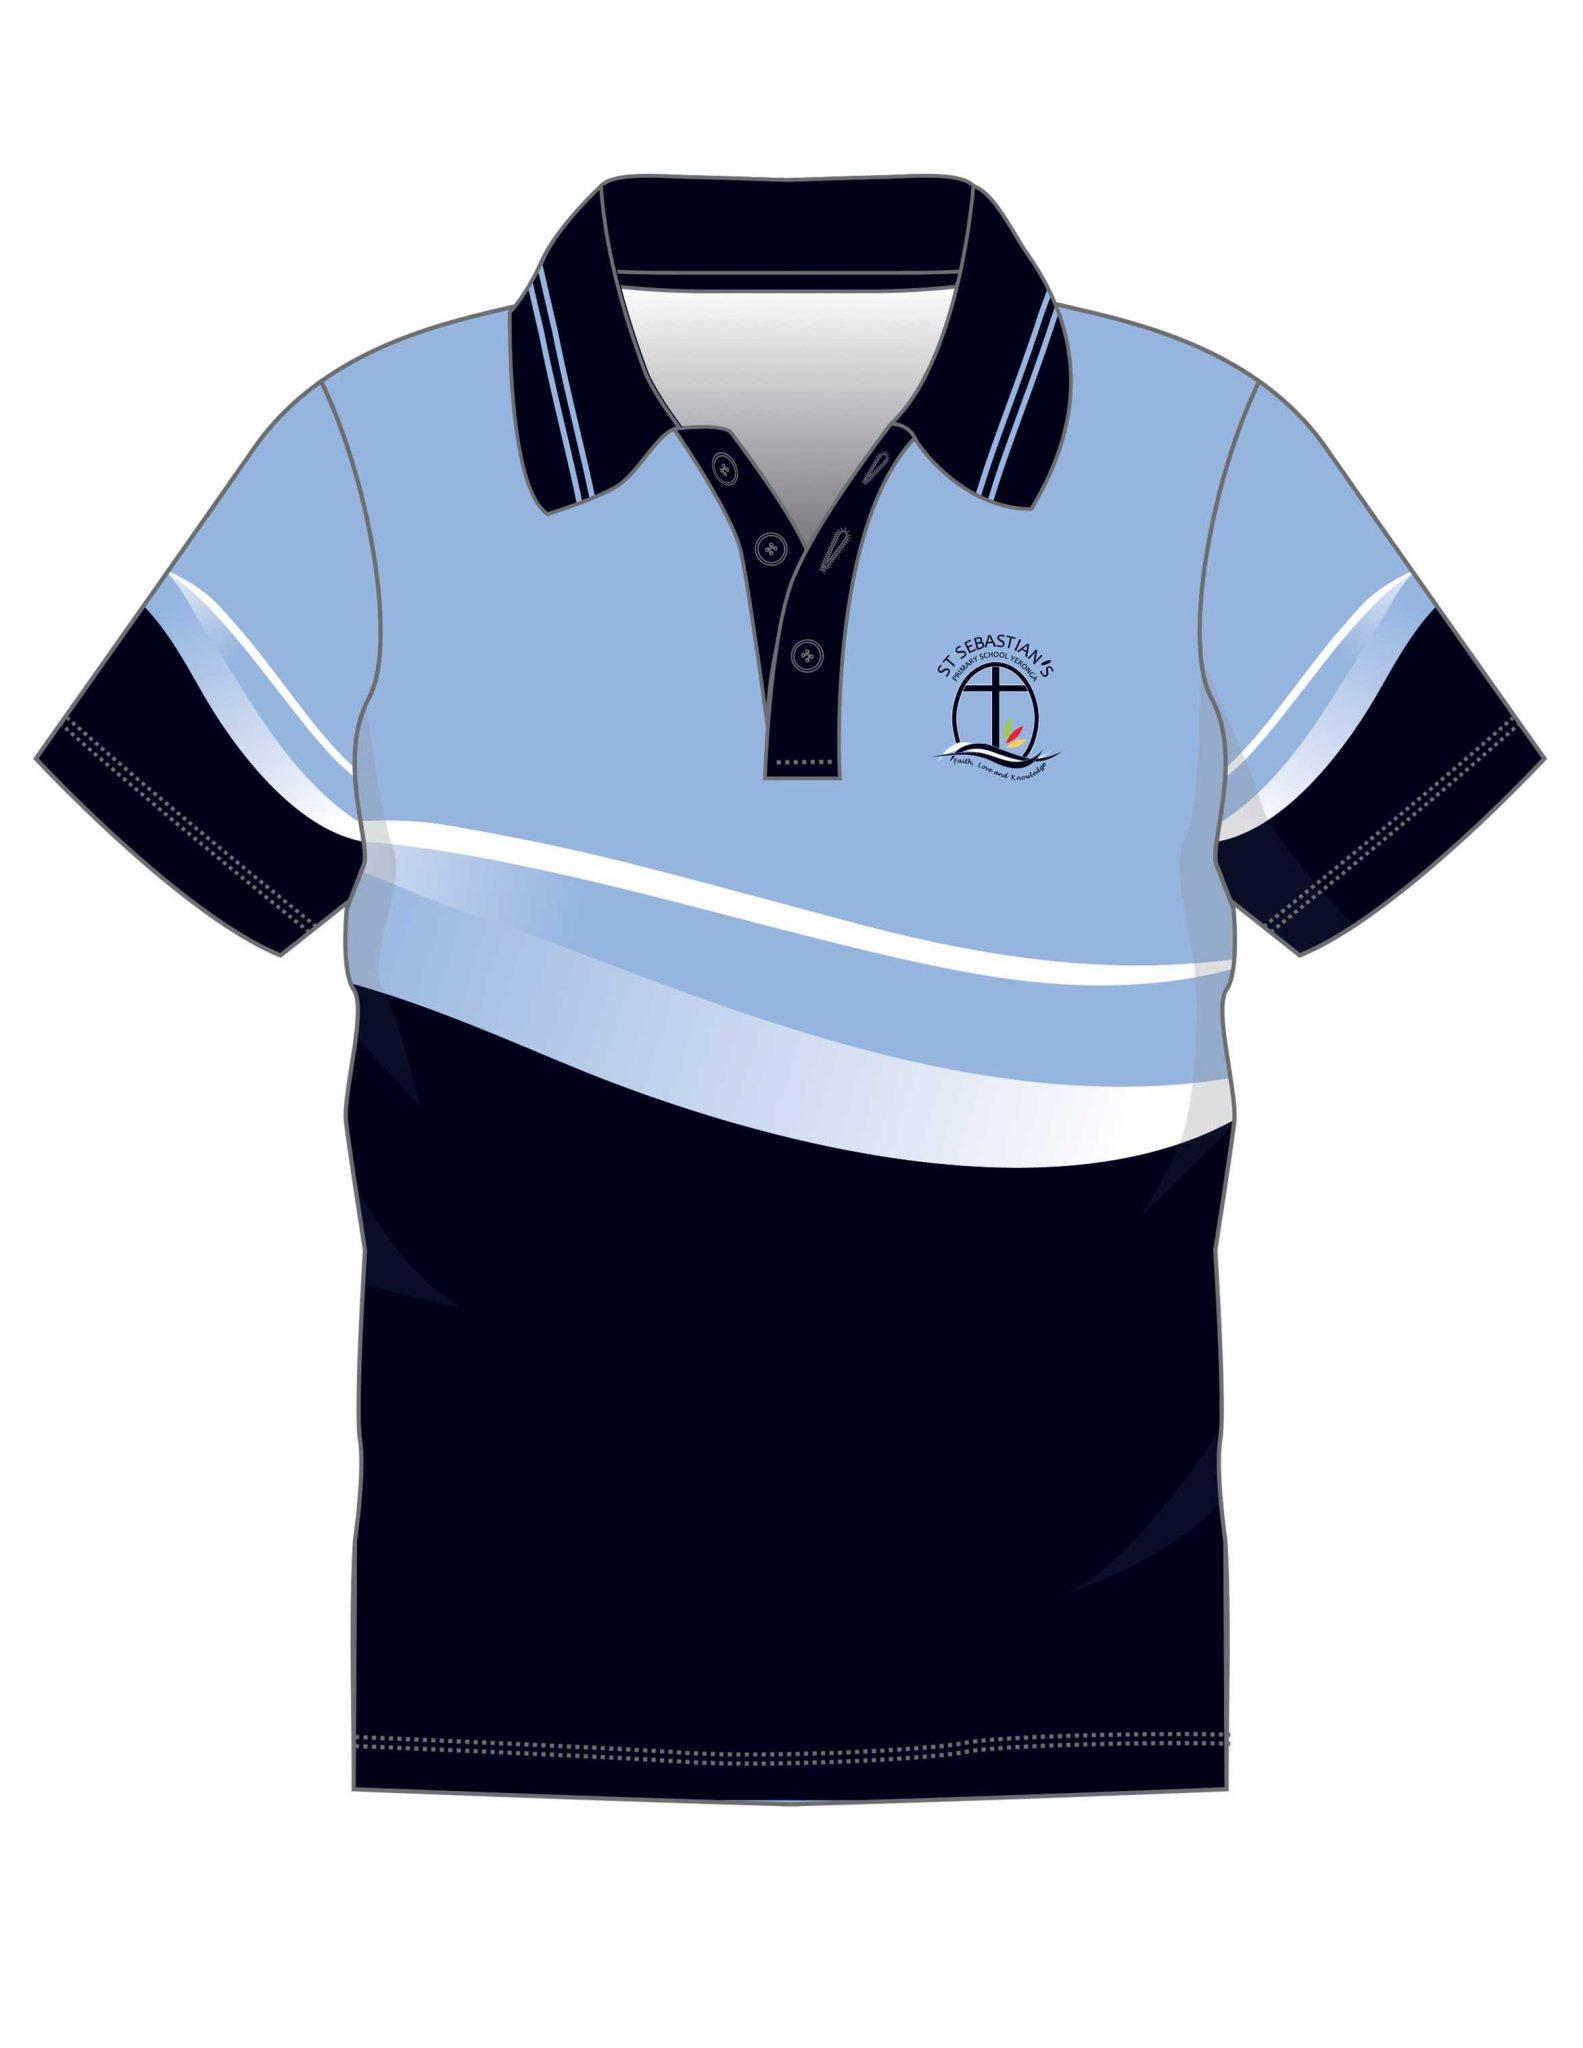 cc826495 School Sublimation Polos - Red Oak School Uniforms